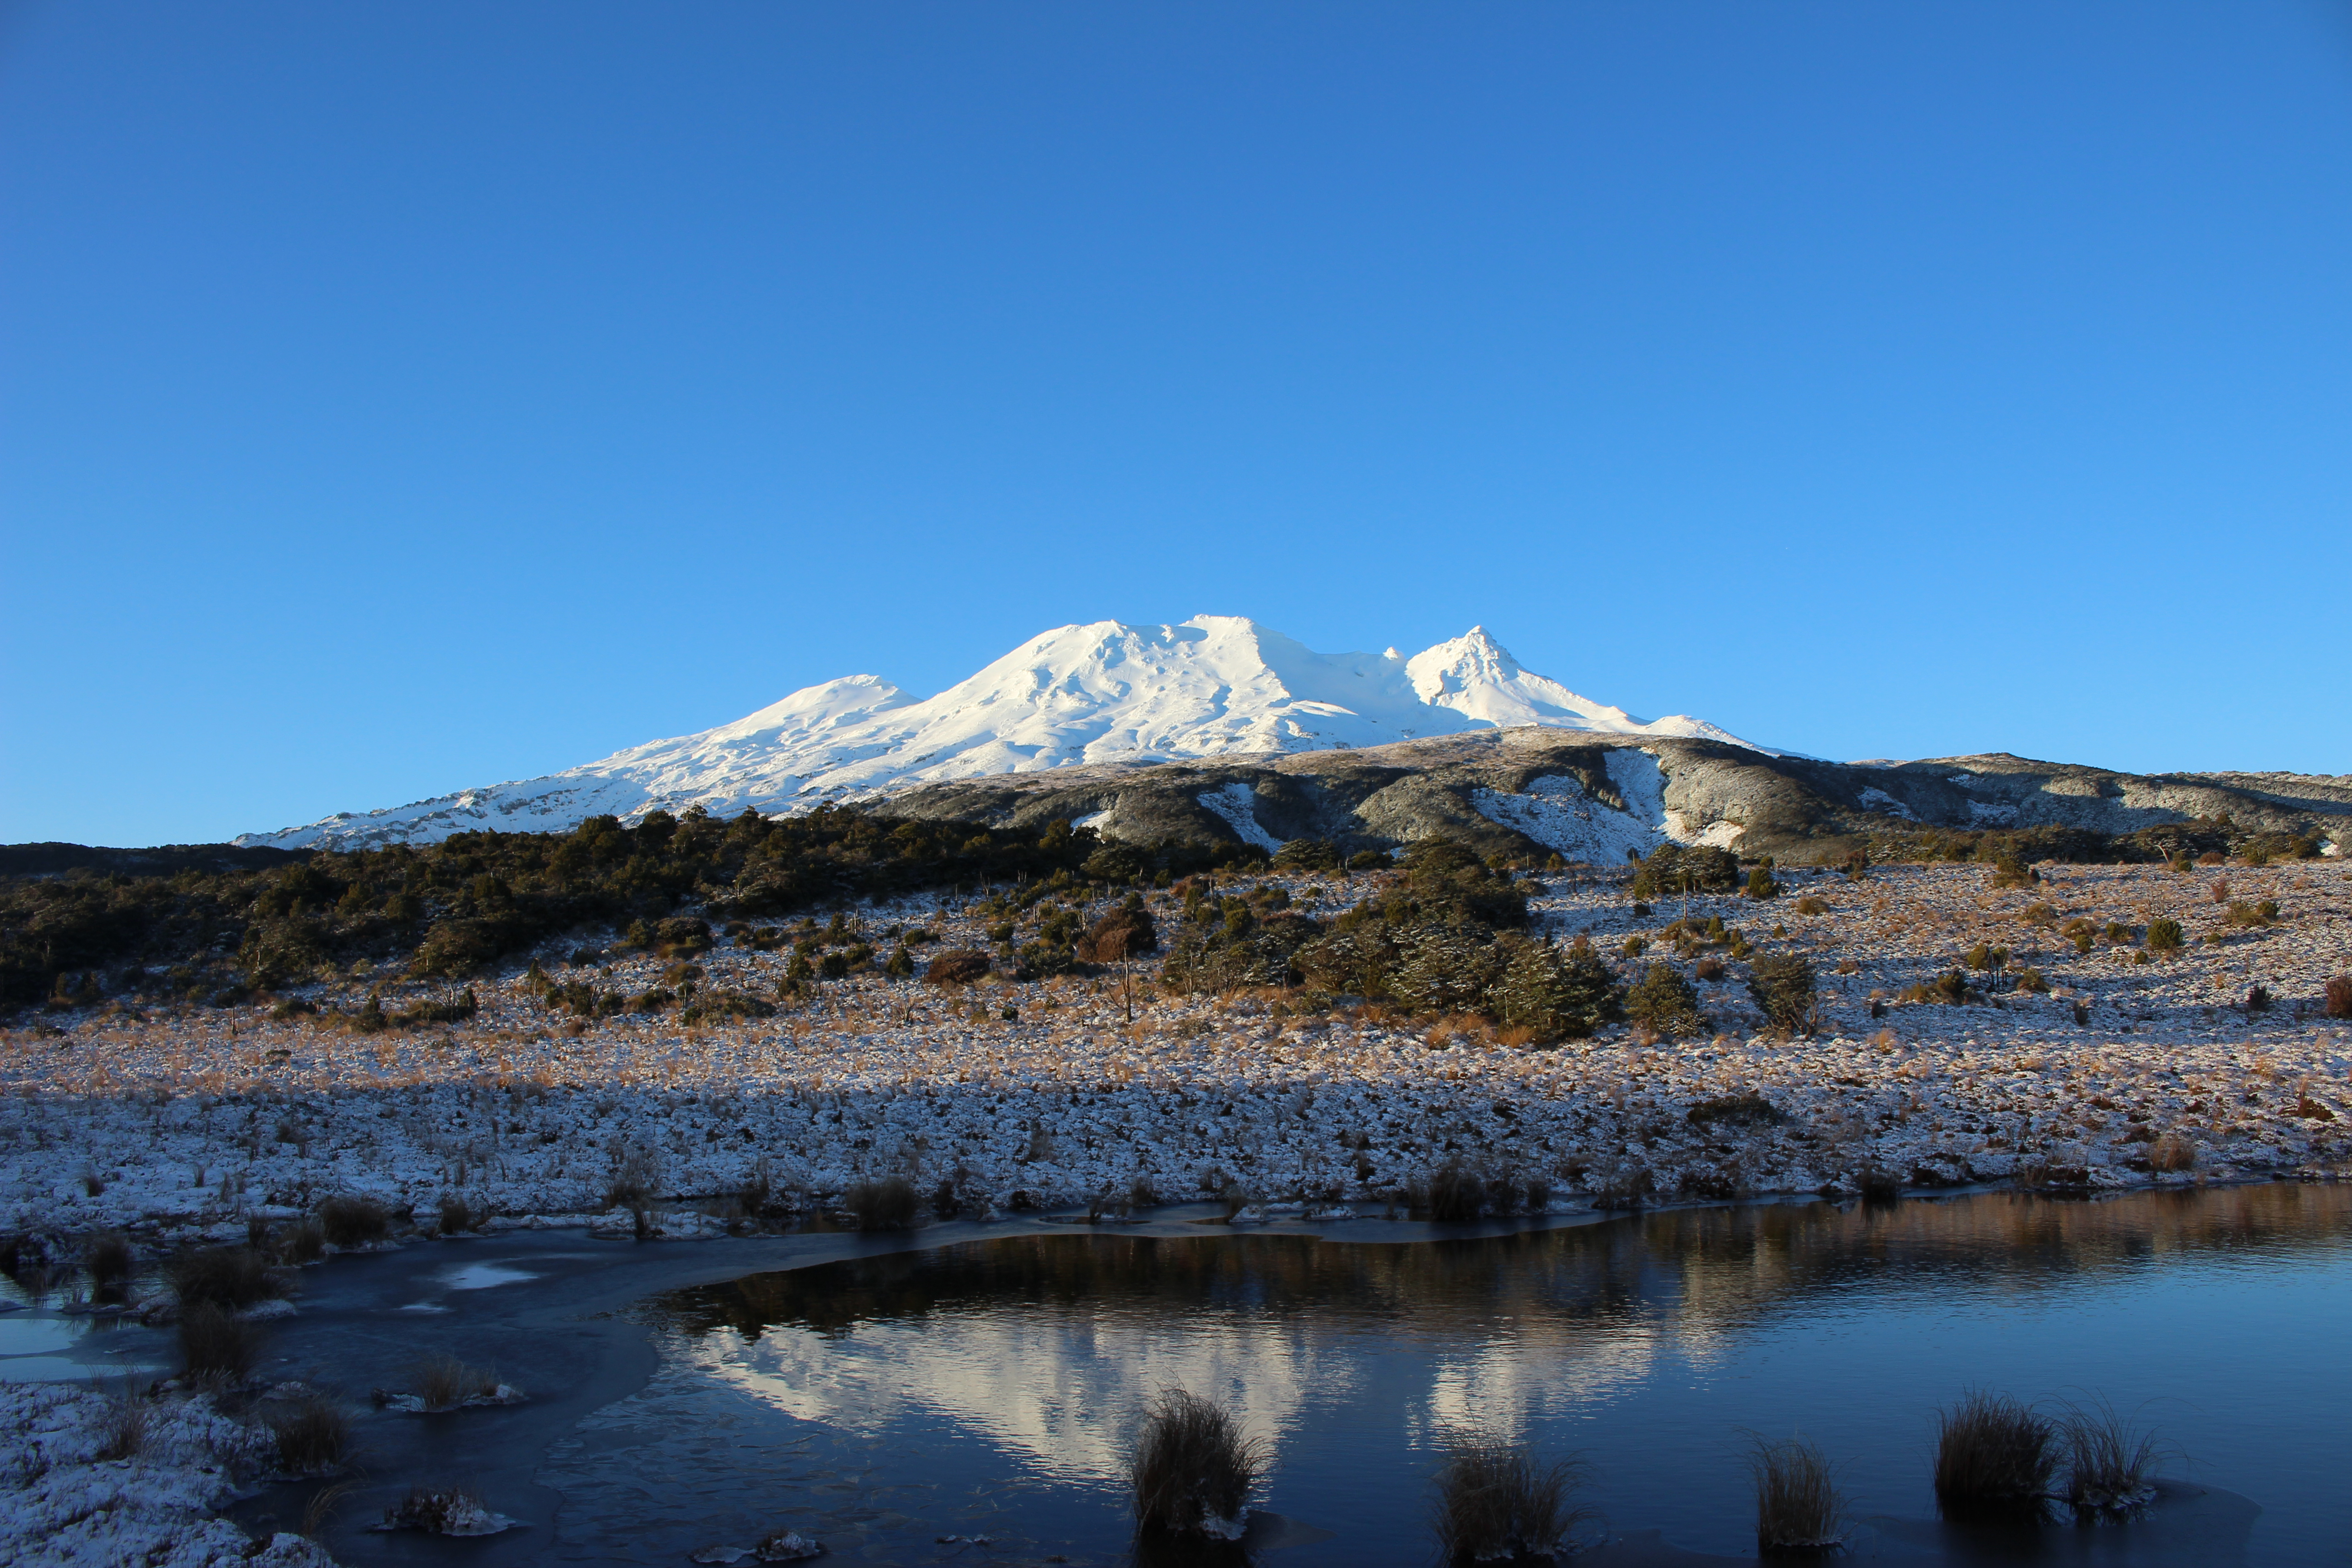 New Zeland Update: Snowboard All Summer In New Zealand. 2016 Winter Update